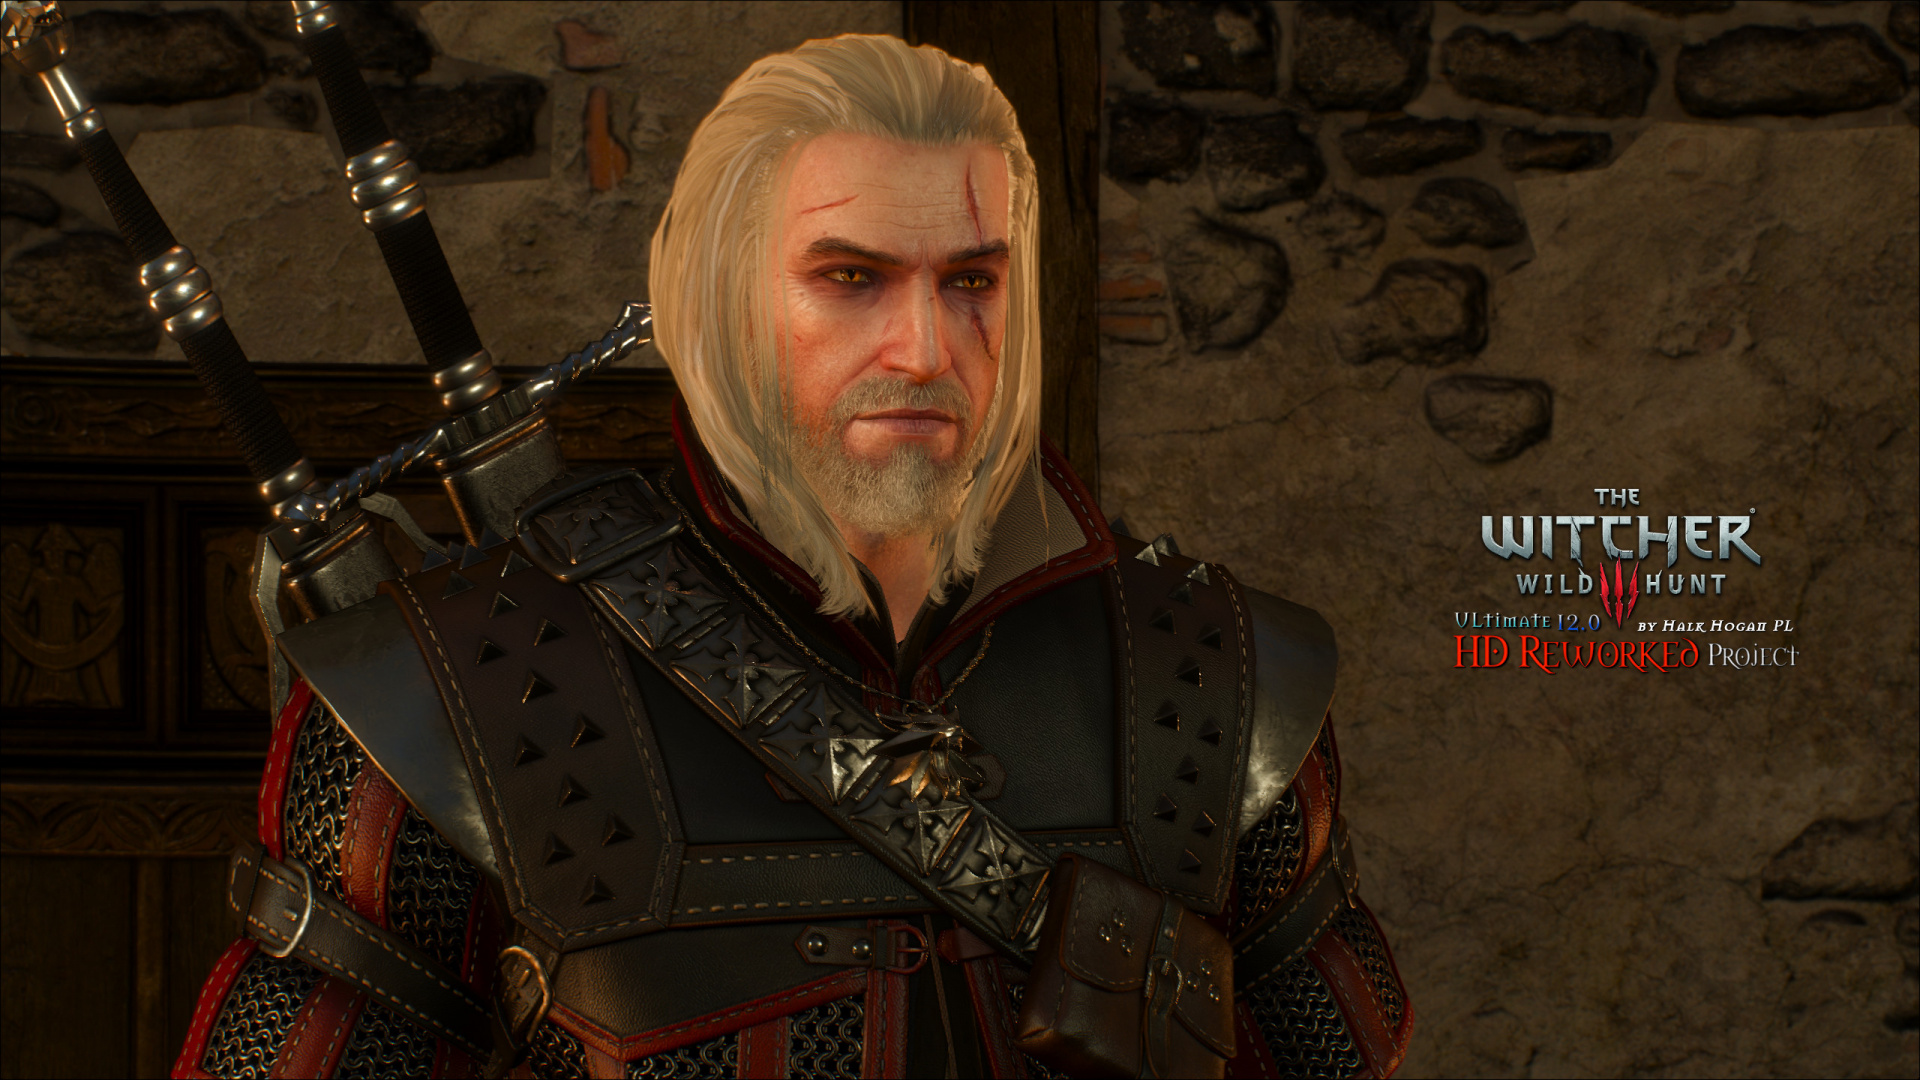 Субботний кинозал: вышла новая версия мода The Witcher3 HD Reworked Project